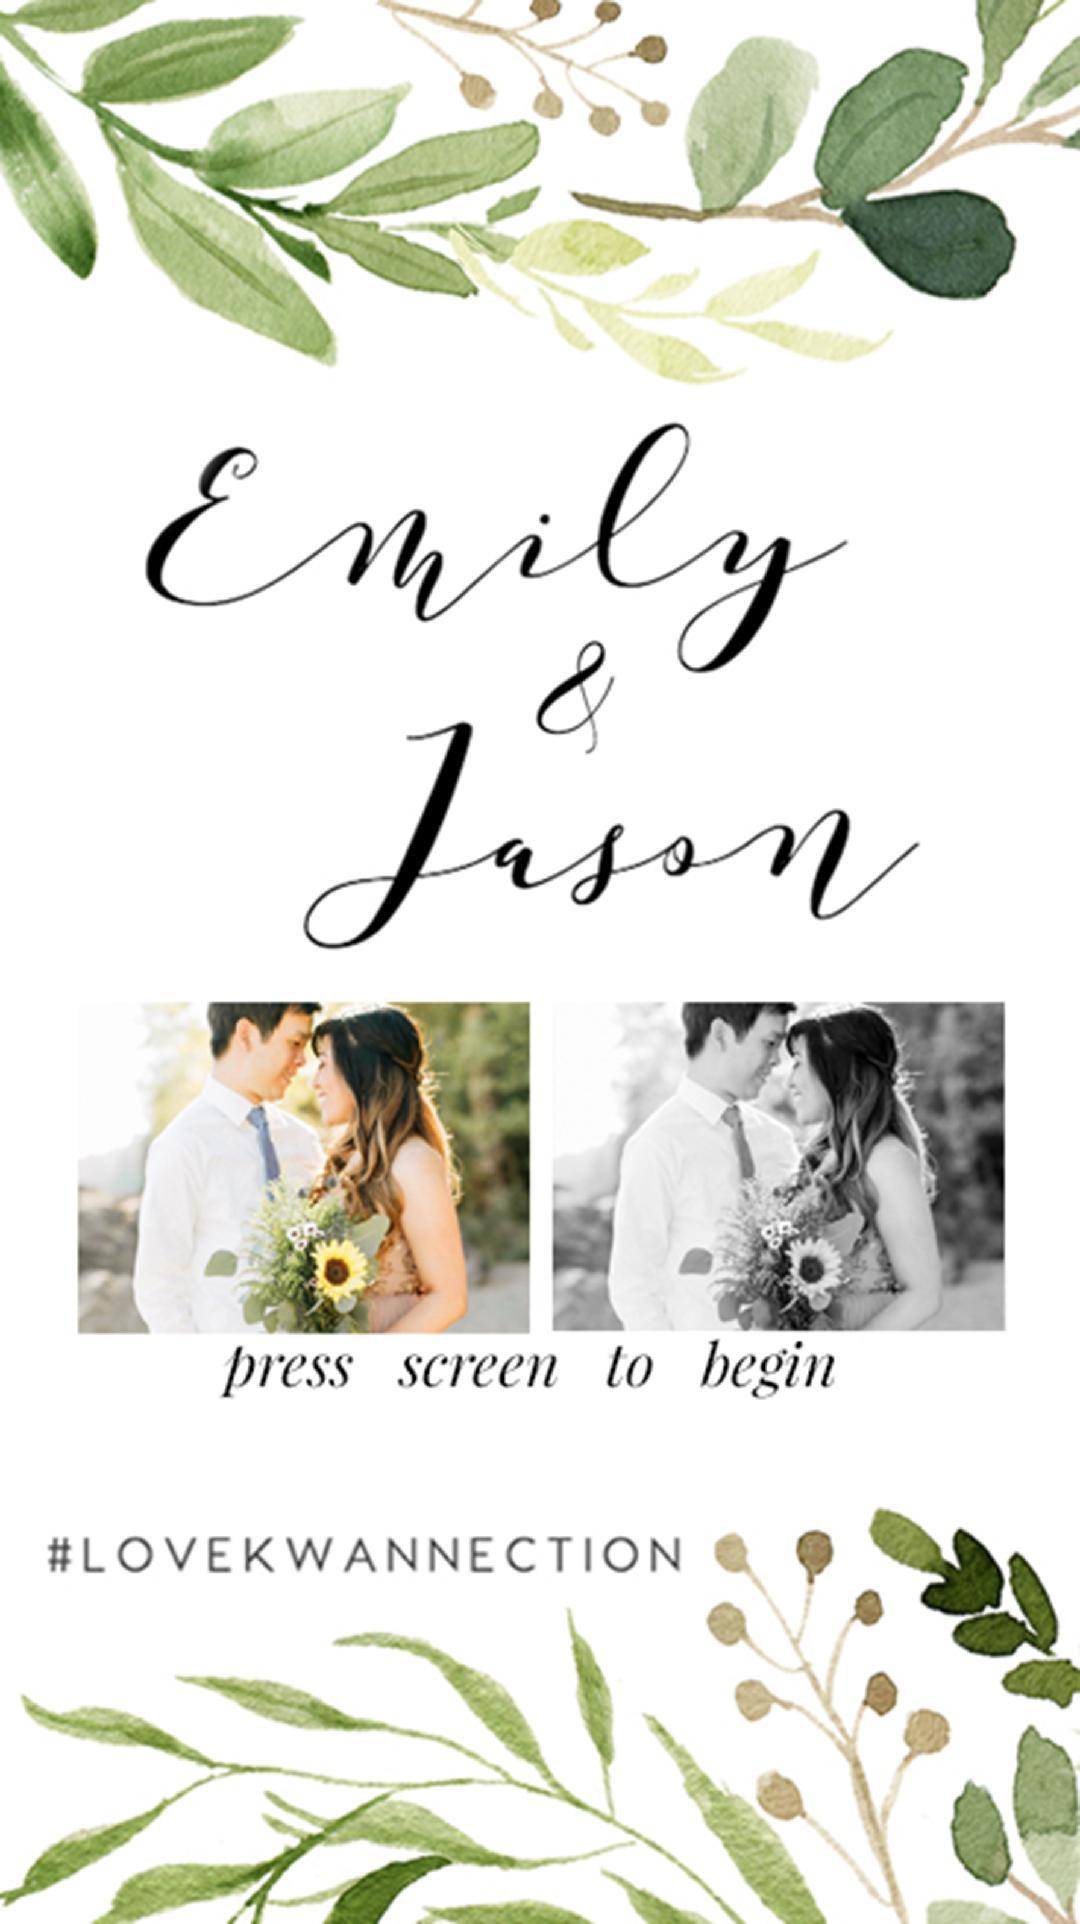 Emily&Jason - Photo Booth Touchscreen.jpeg